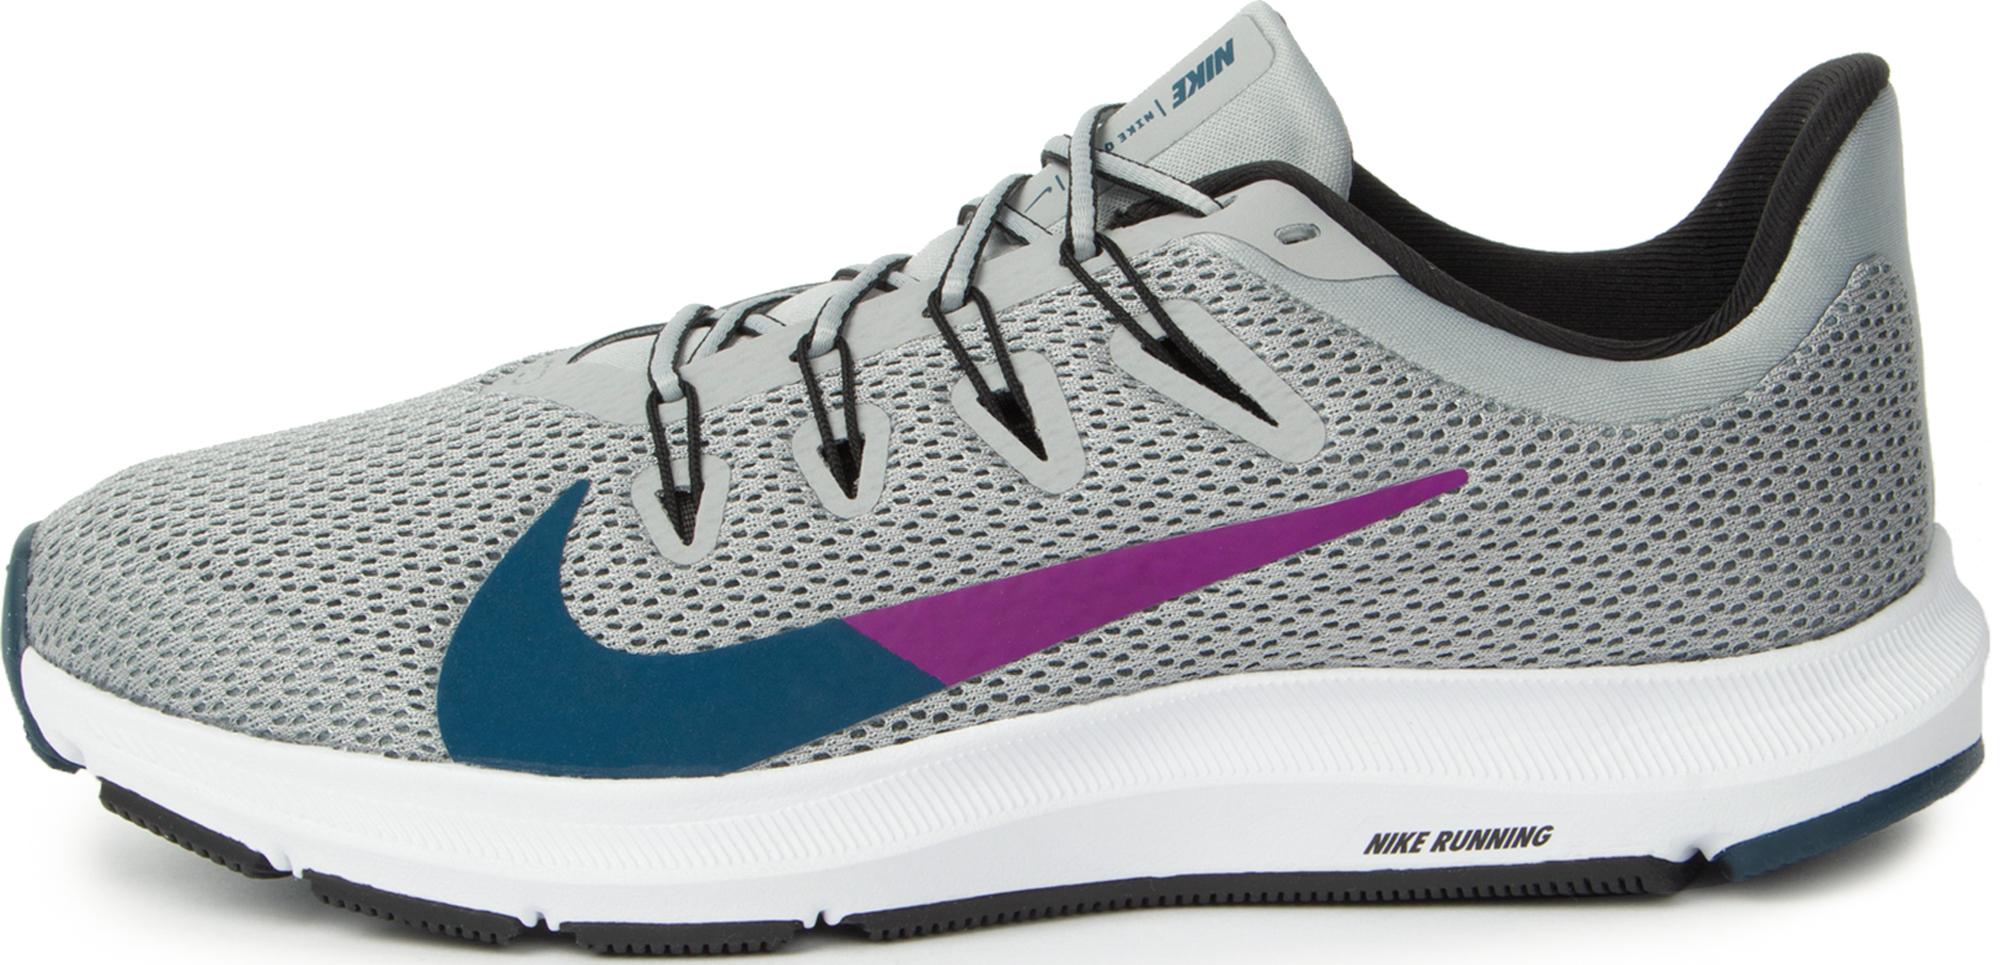 Nike Кроссовки женские Nike Quest 2, размер 35.5